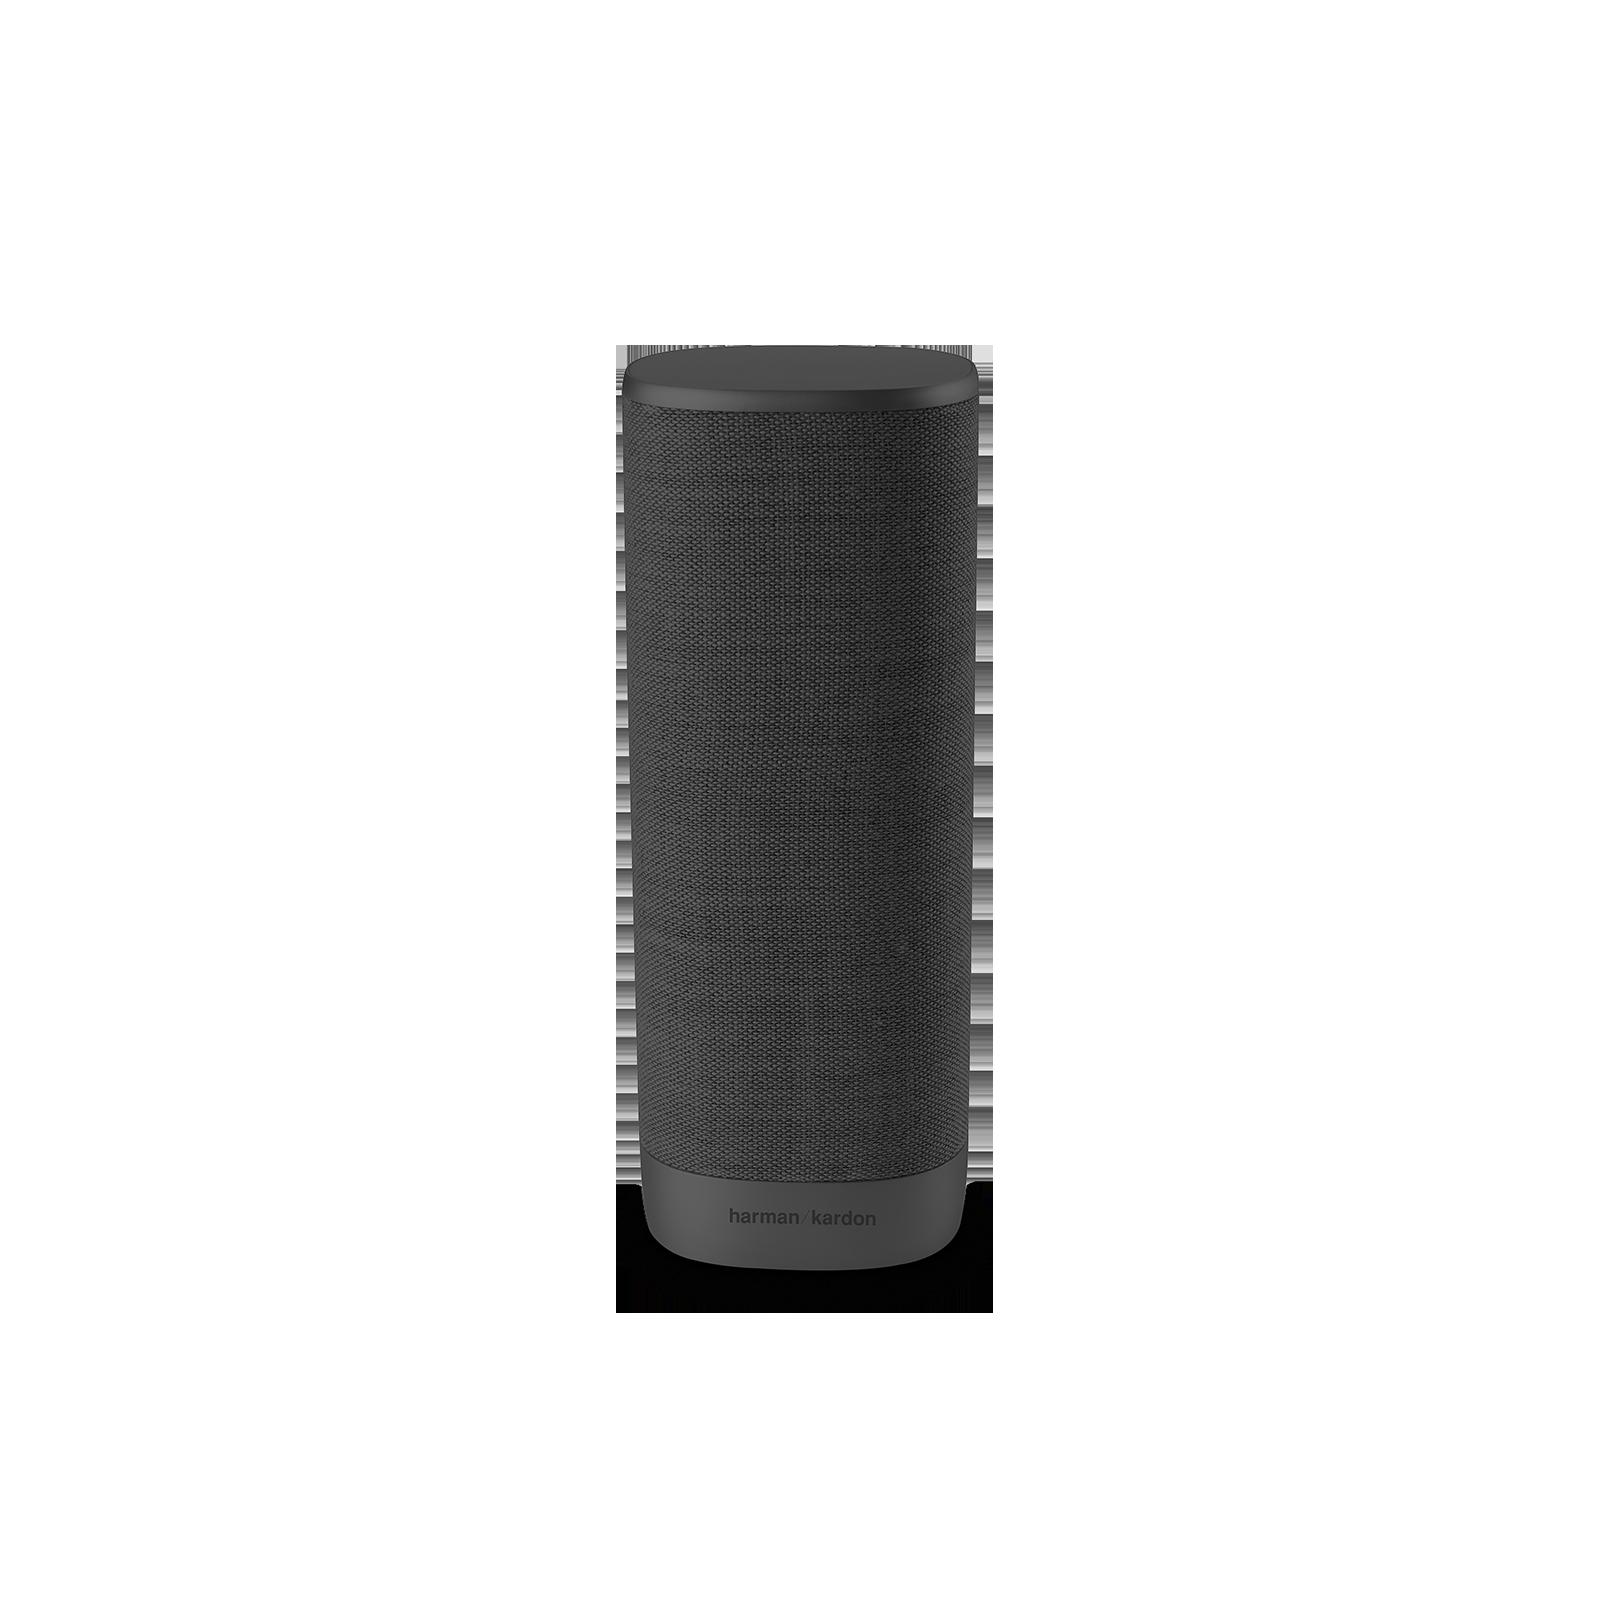 Harman Kardon Citation Surround - Black - Surround sound for immersive movie experience - Front